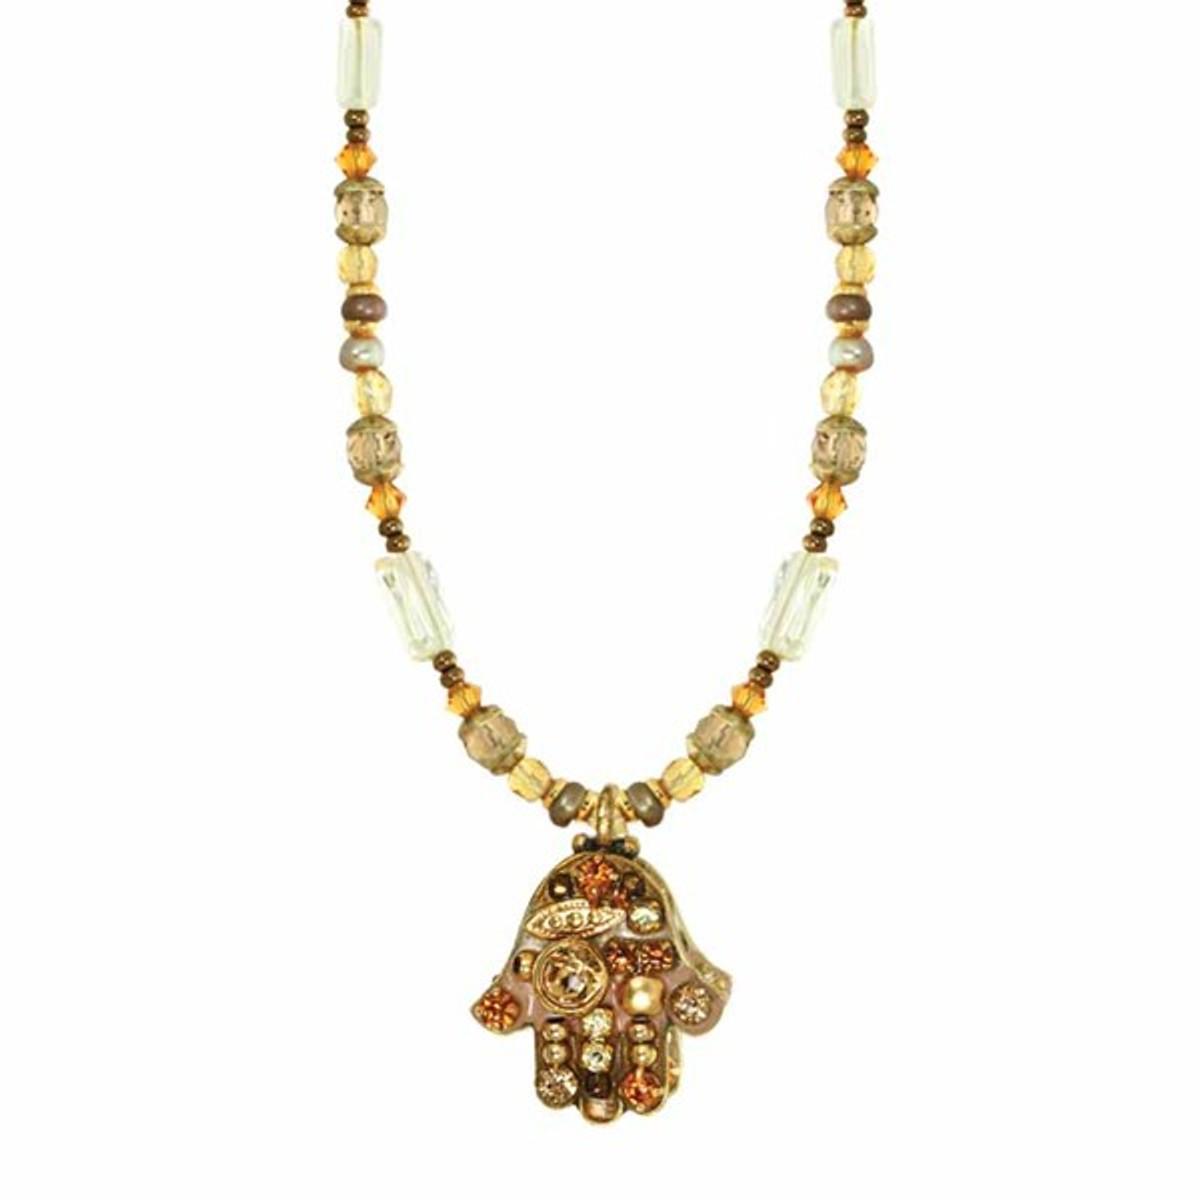 Beuige Hamsa Necklace on Beaded Chain